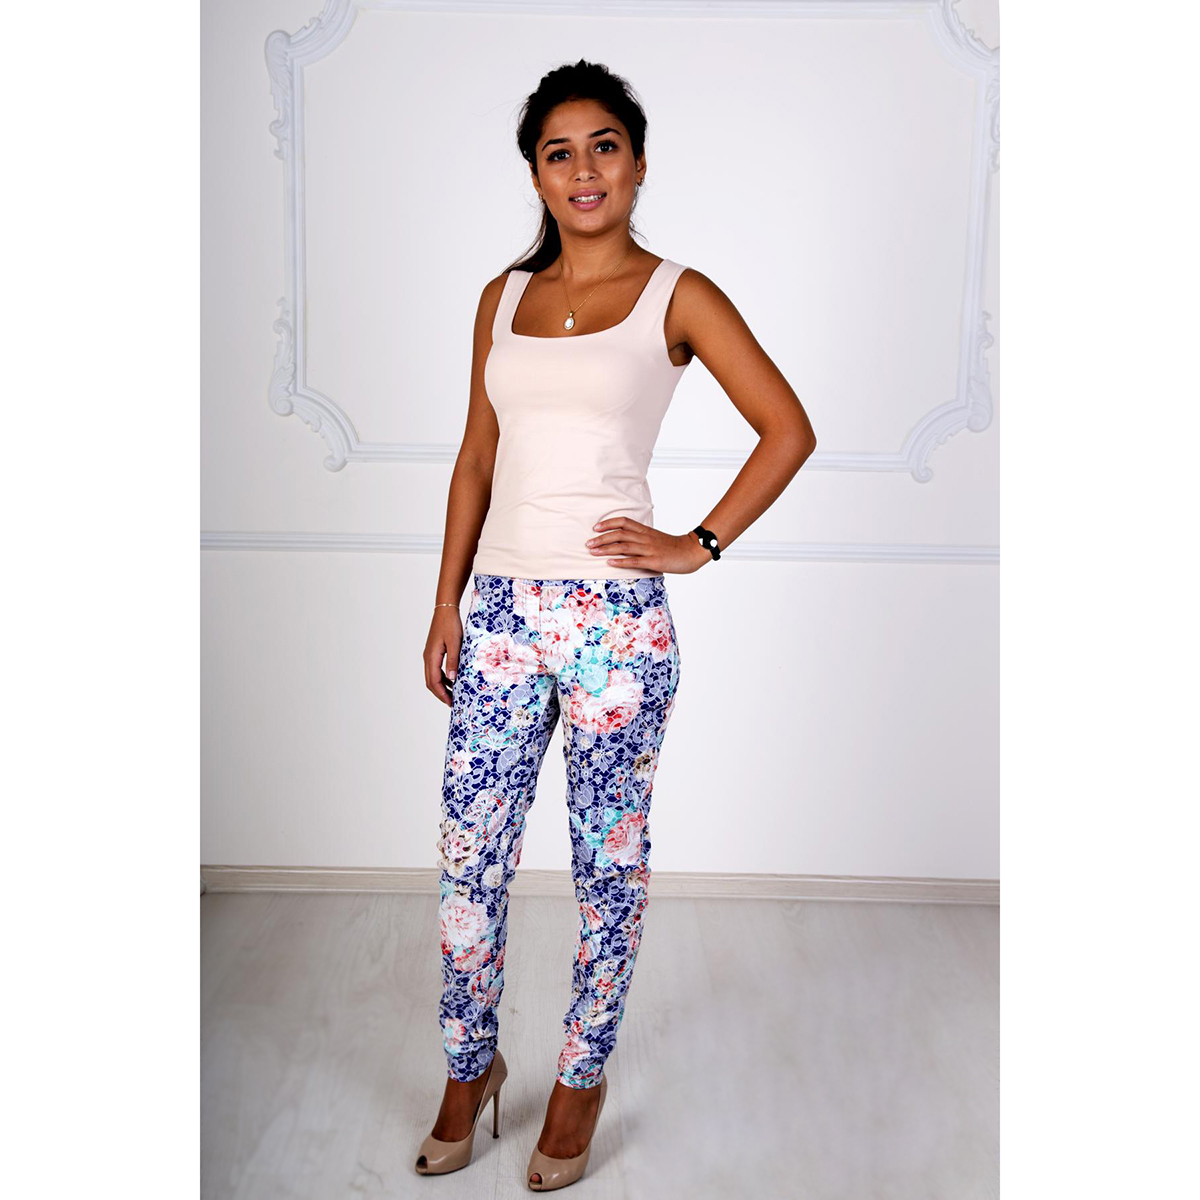 Женские брюки Жаккард арт. 0250, размер 48Шорты, бриджи, брюки<br>Обхват талии:78 см<br>Обхват бедер:104 см<br>Длина по внут. шву:73 см<br>Рост:167 см<br><br>Тип: Жен. брюки<br>Размер: 48<br>Материал: Жаккард